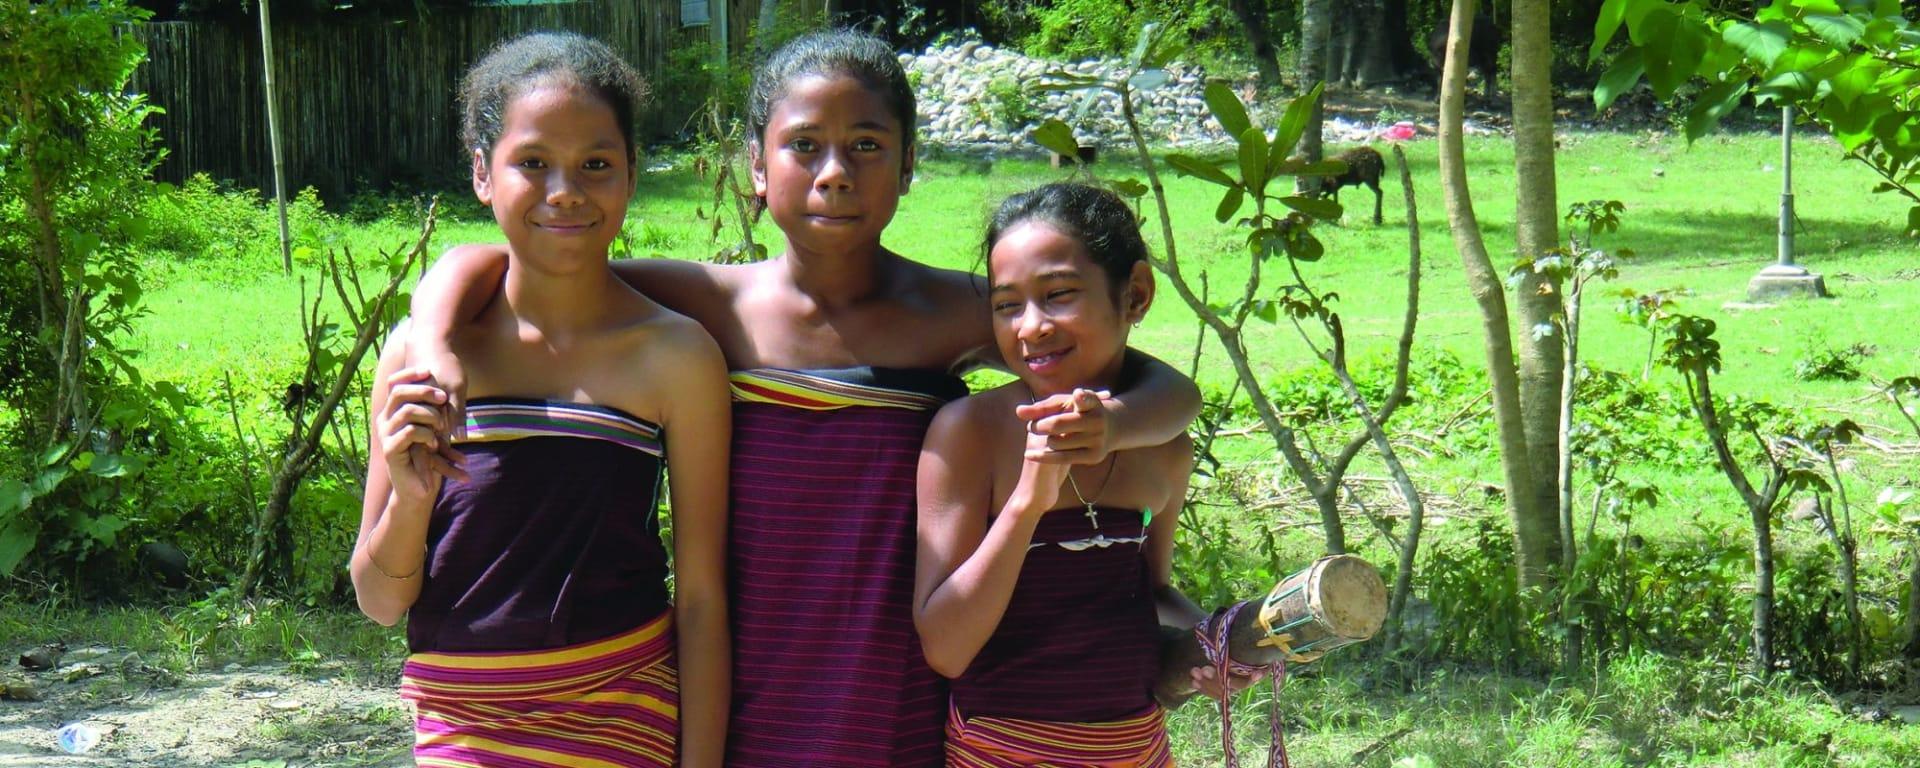 Unbekanntes Paradies Timor-Leste ab Dili: Young girls